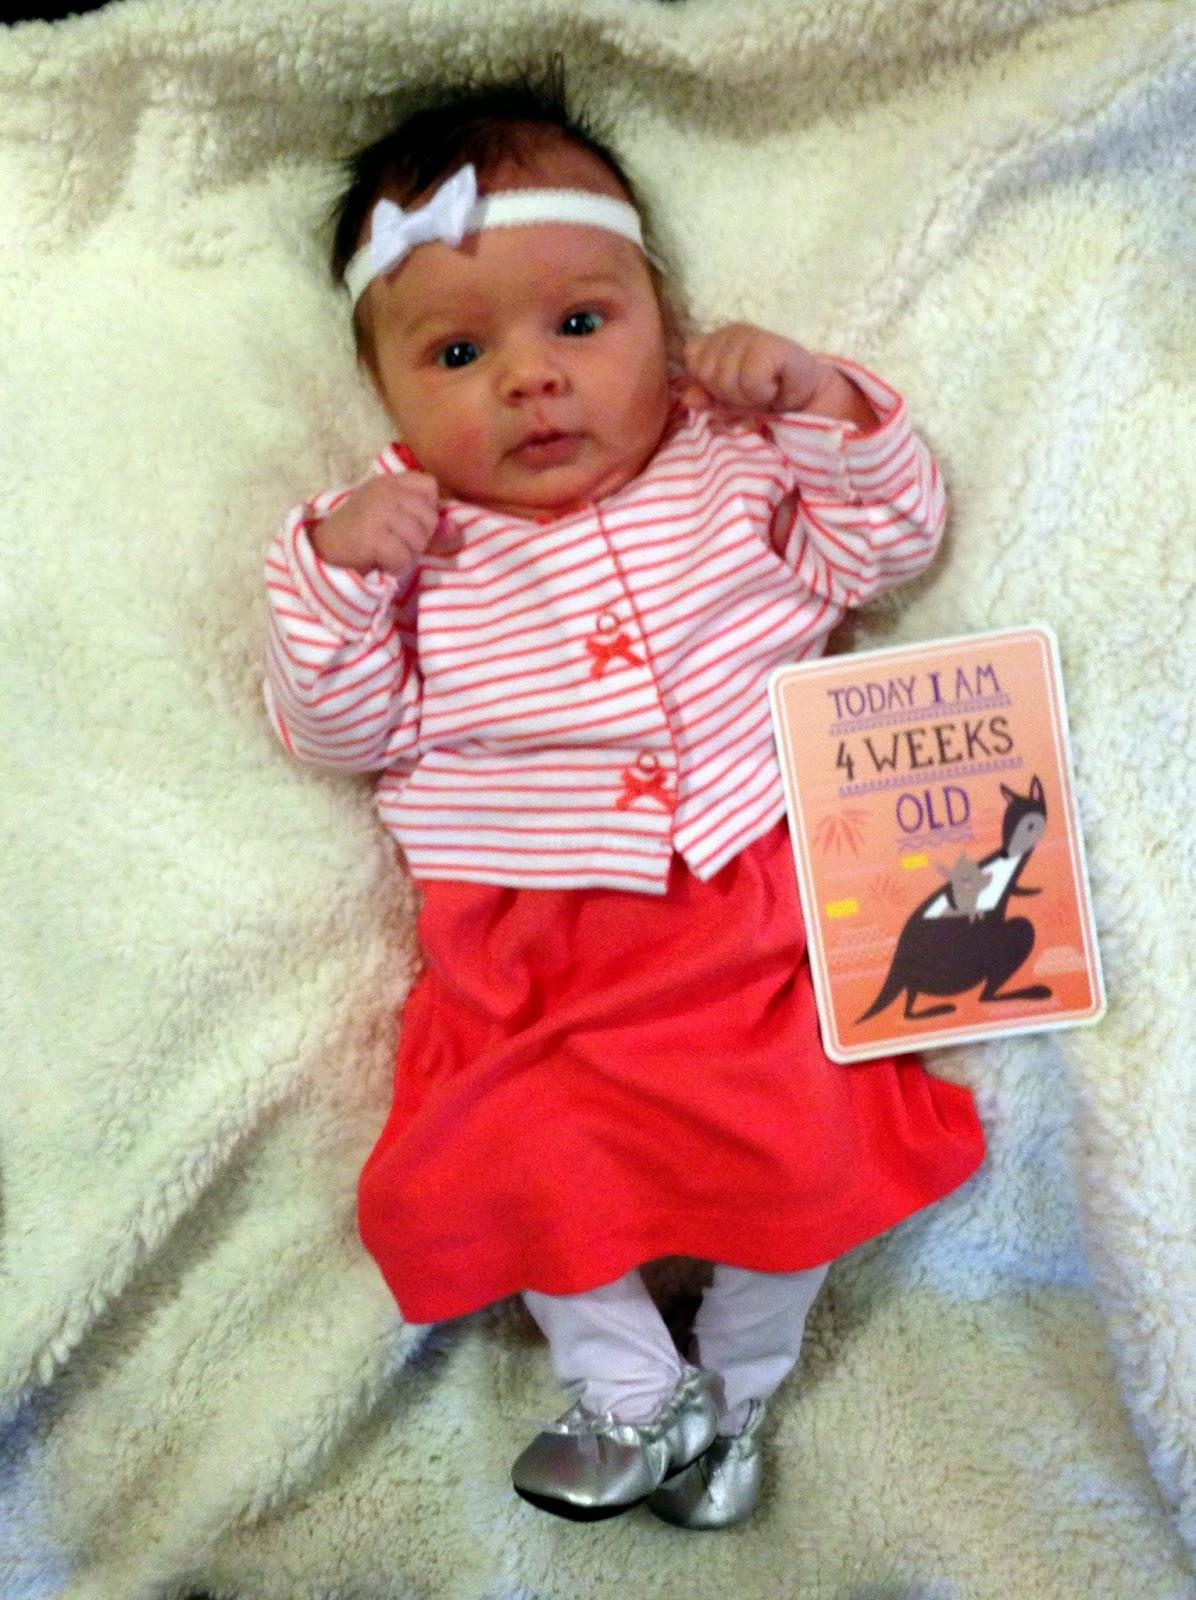 Cobo Avonlea One Month Old